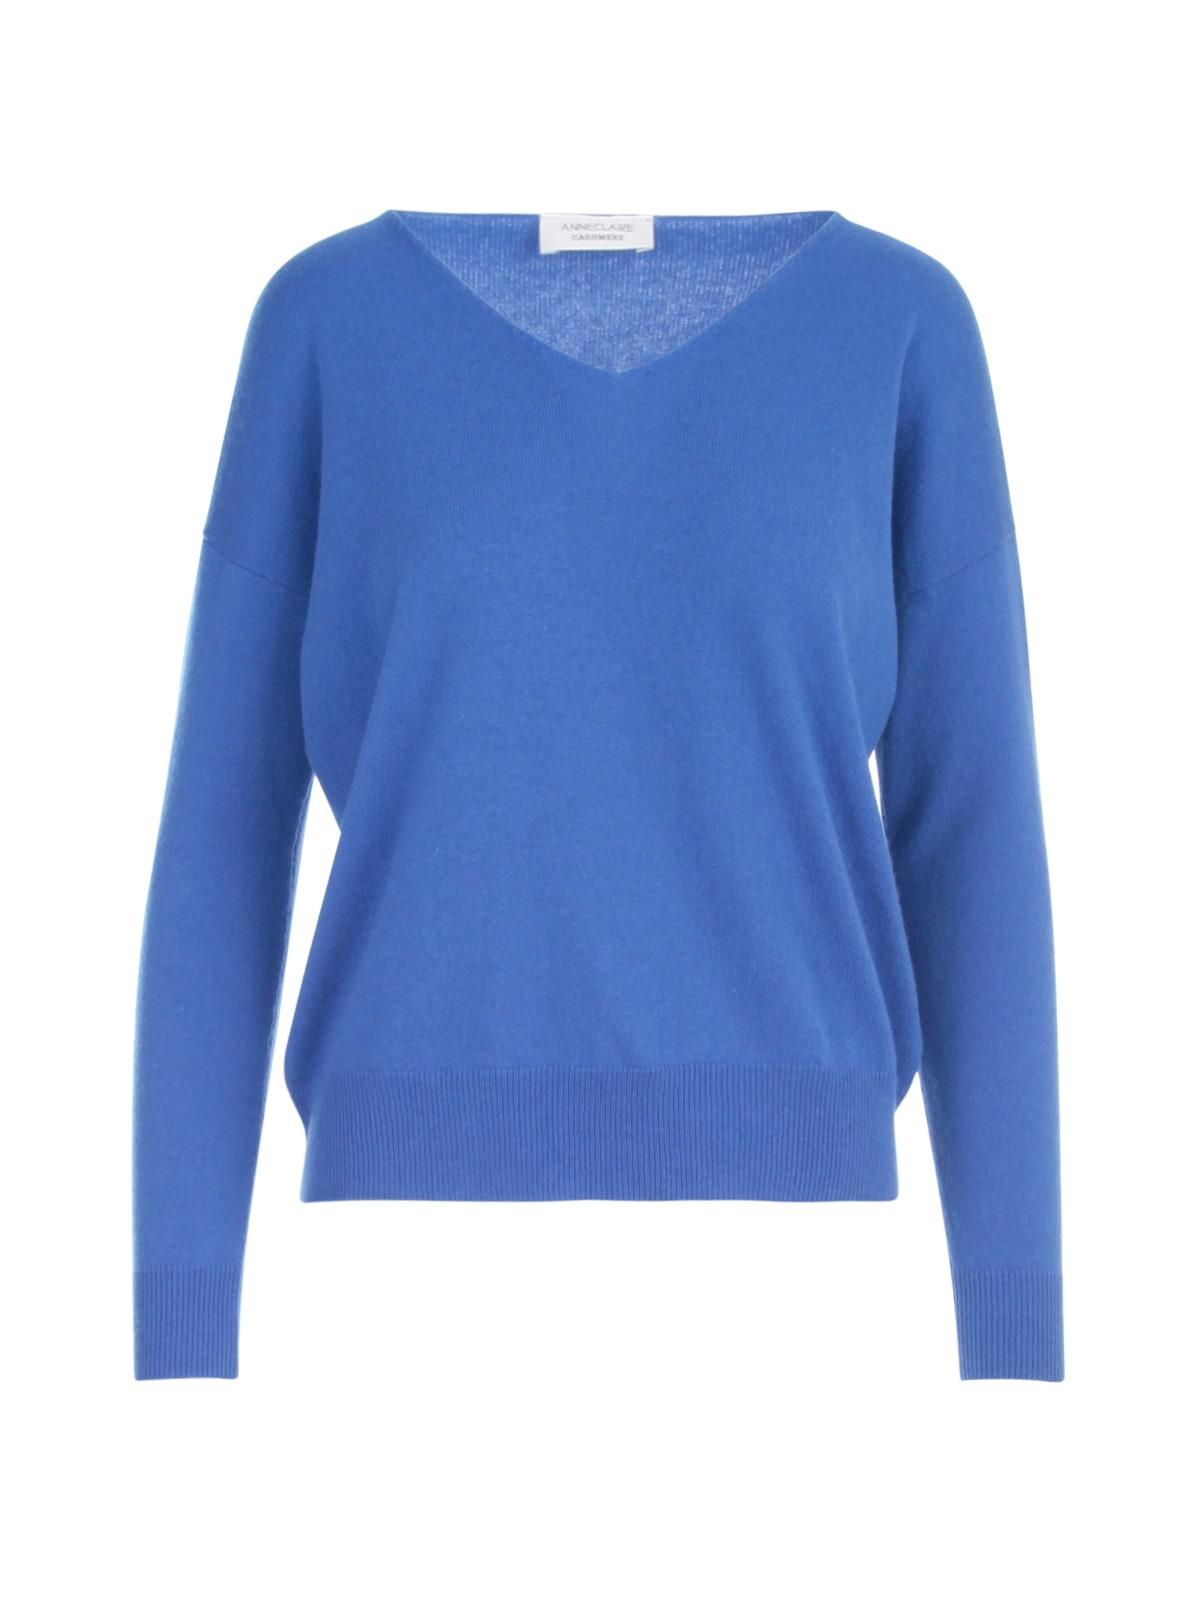 Cashmere V Neck L/s Sweater